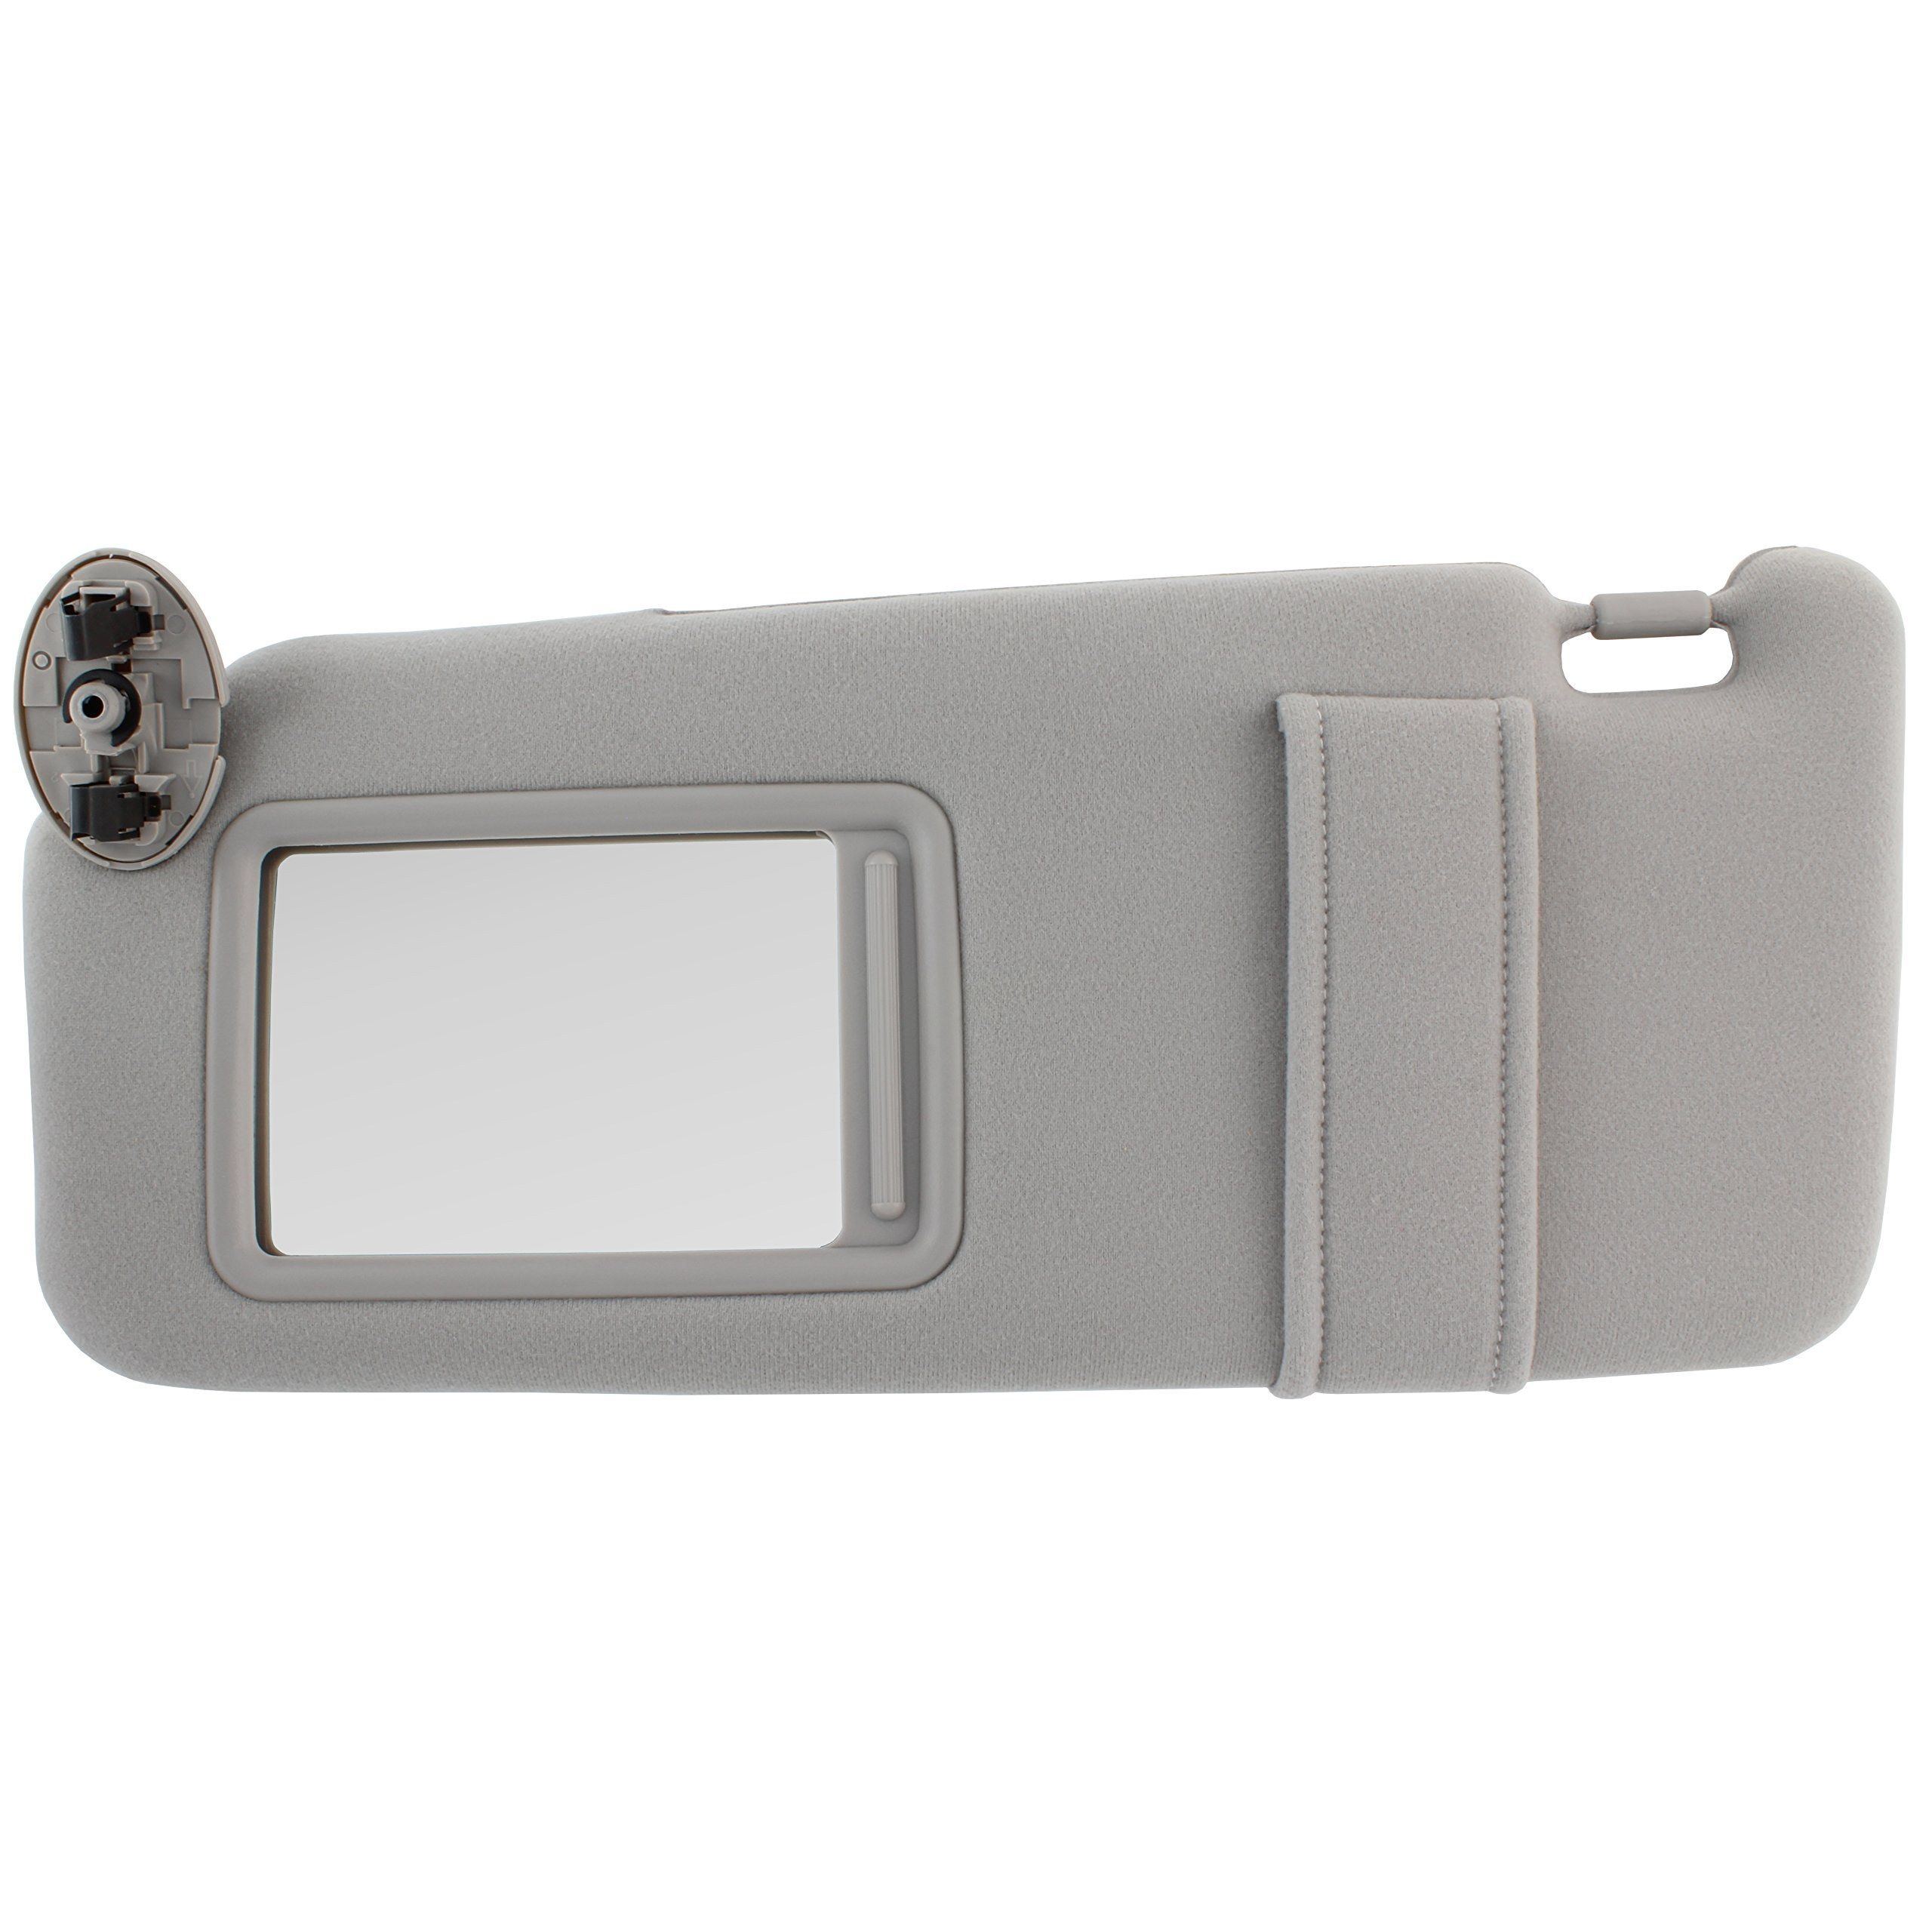 1Pcr Crank Door Handle Knob For Honda Civic 84-00 86 88 90 92 94 96 Window Winde